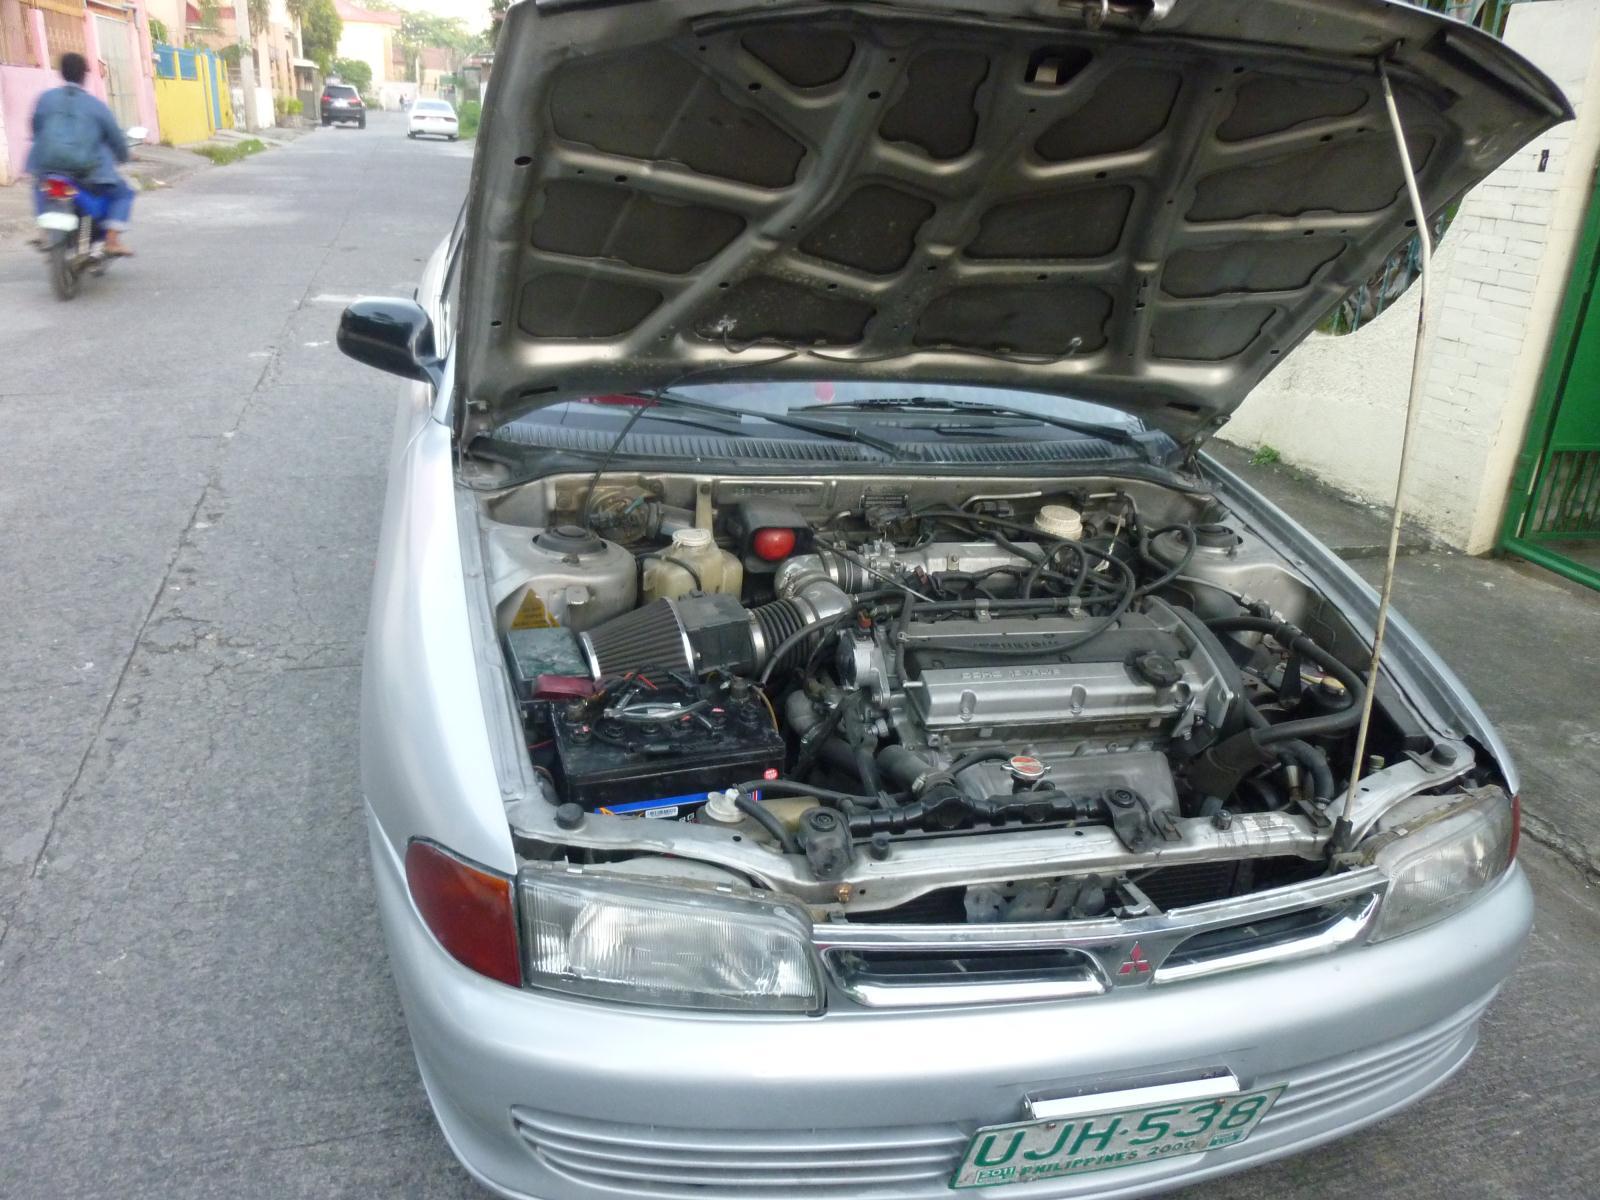 Image Led Jump Start A Car 6